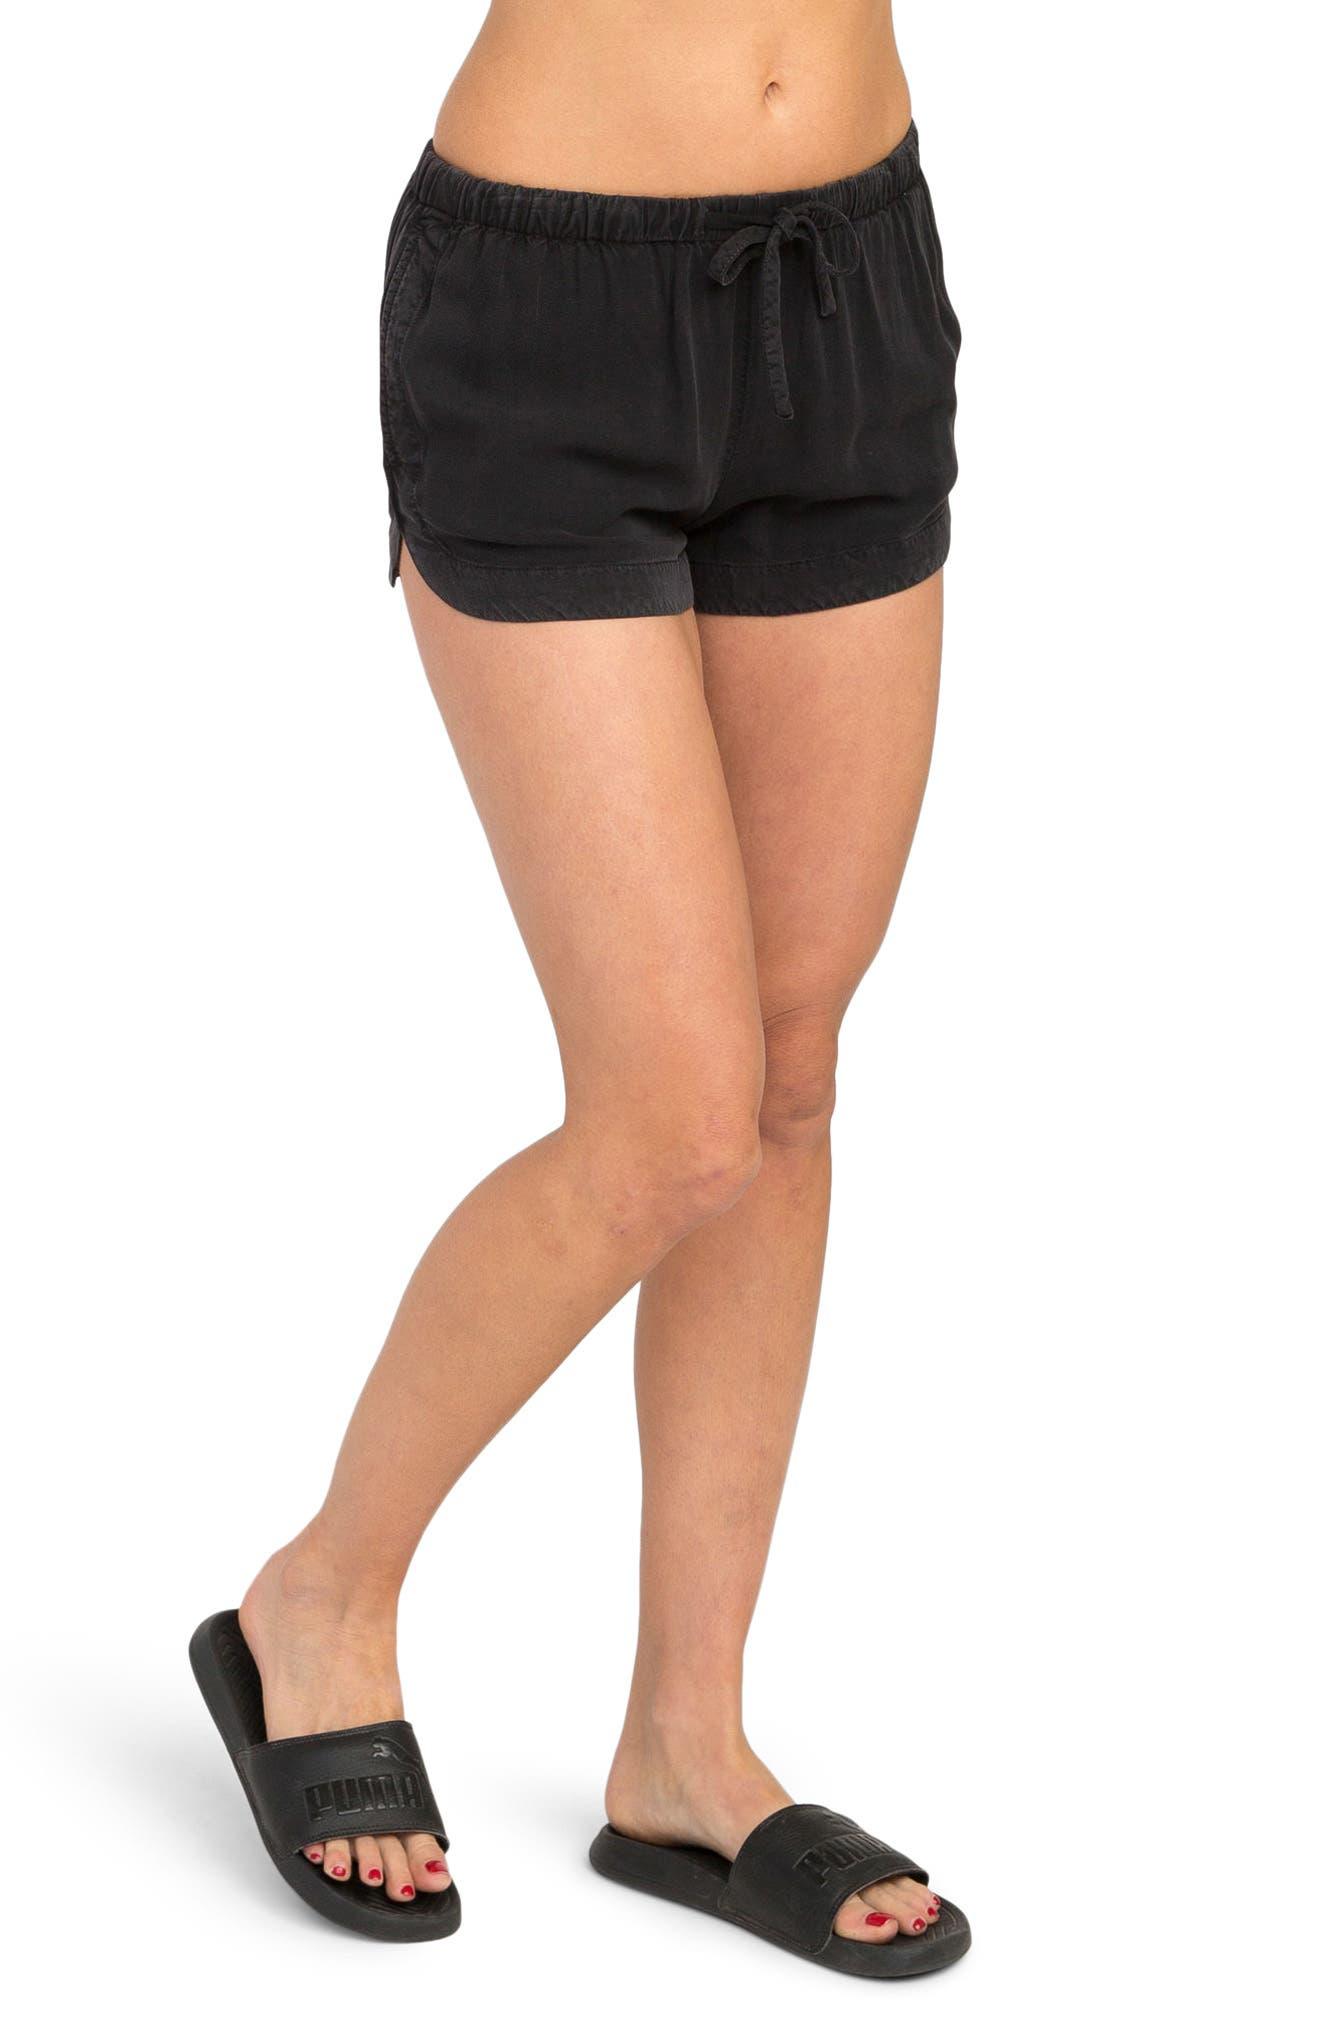 New Yume Dolphin Shorts,                             Main thumbnail 1, color,                             Black